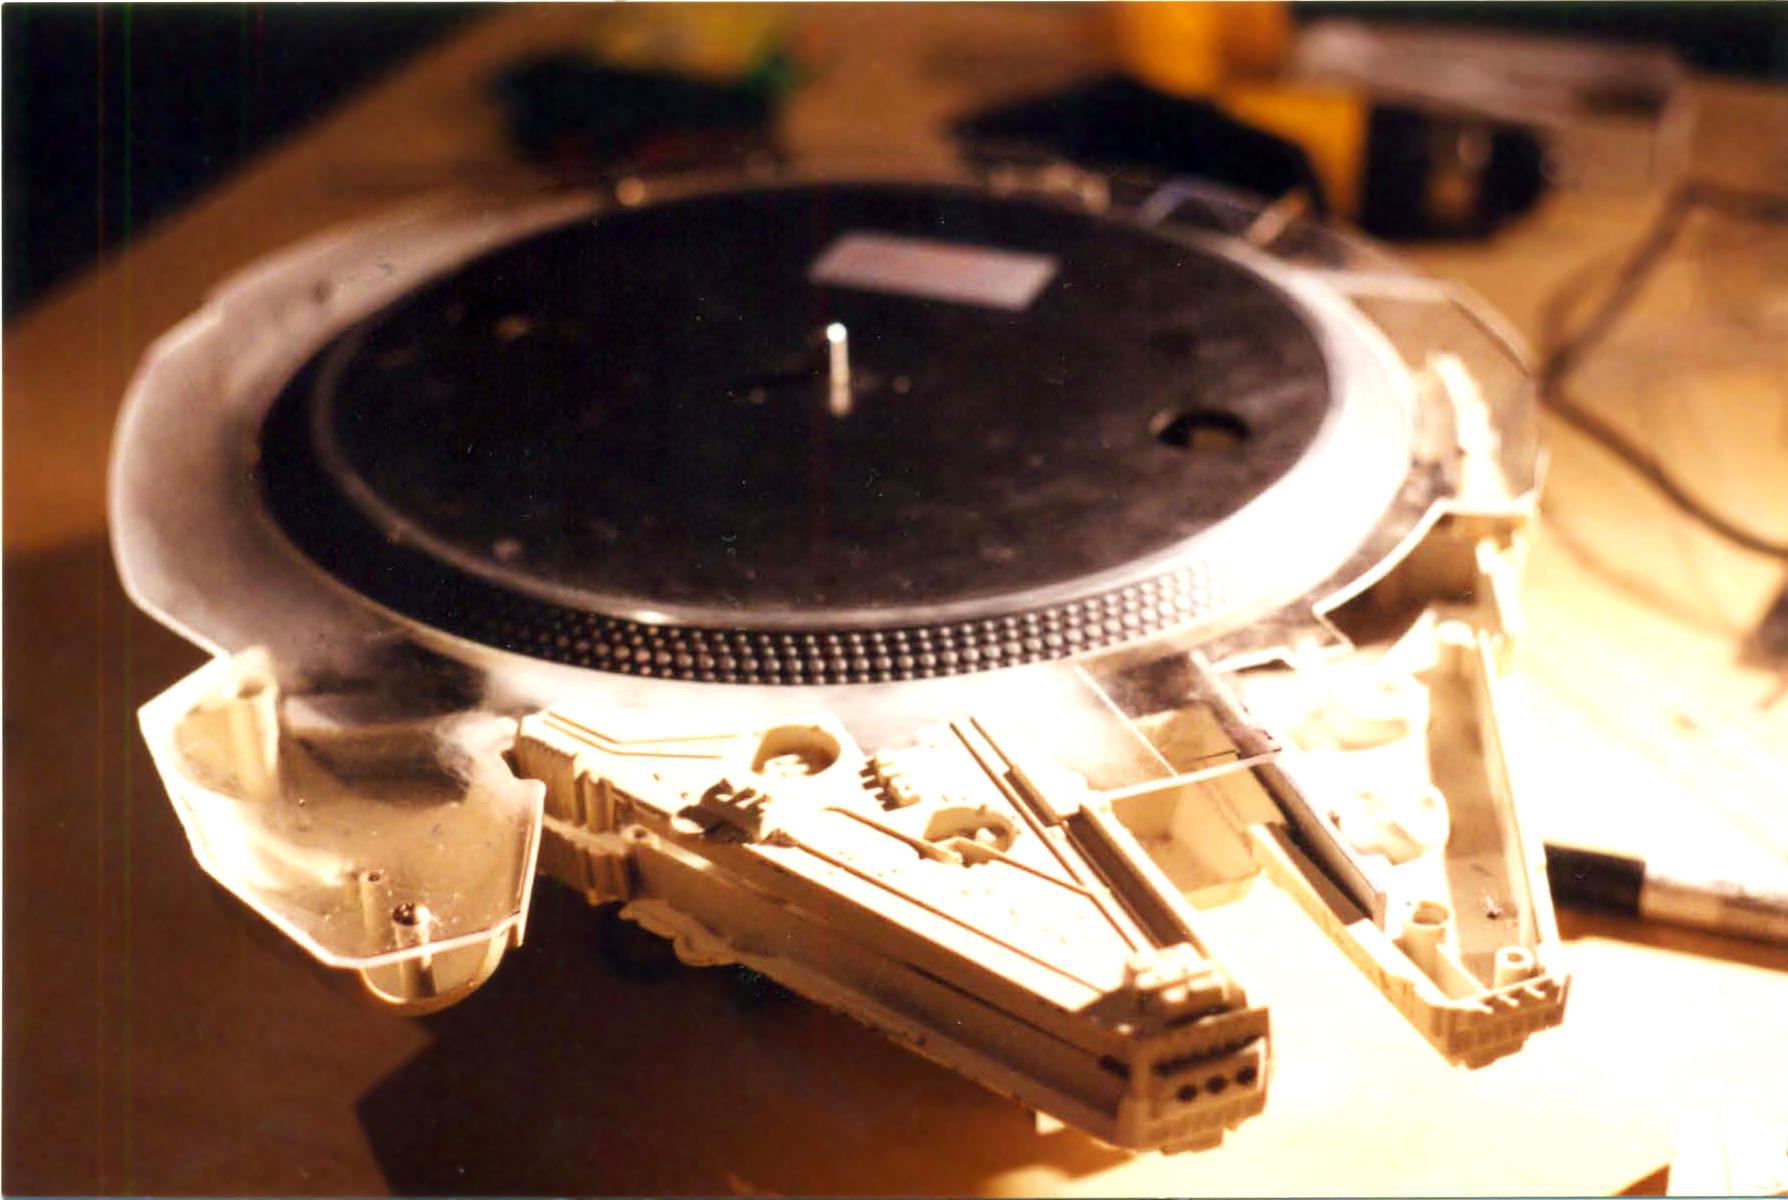 Millennium 1200 A Turntable Built Inside A Repurposed